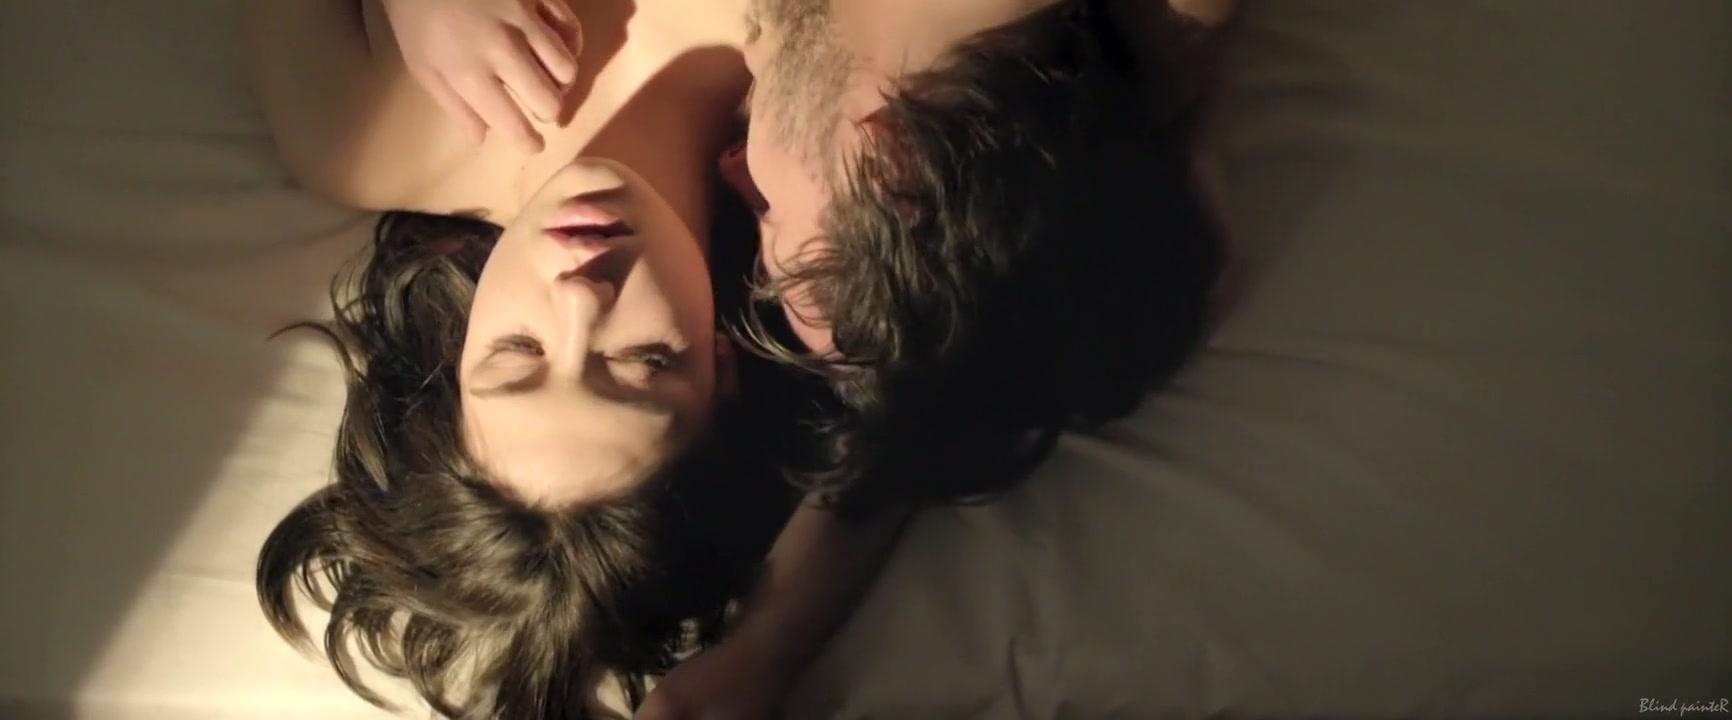 Sexy xxx video Perfect naturals bouncing boobs